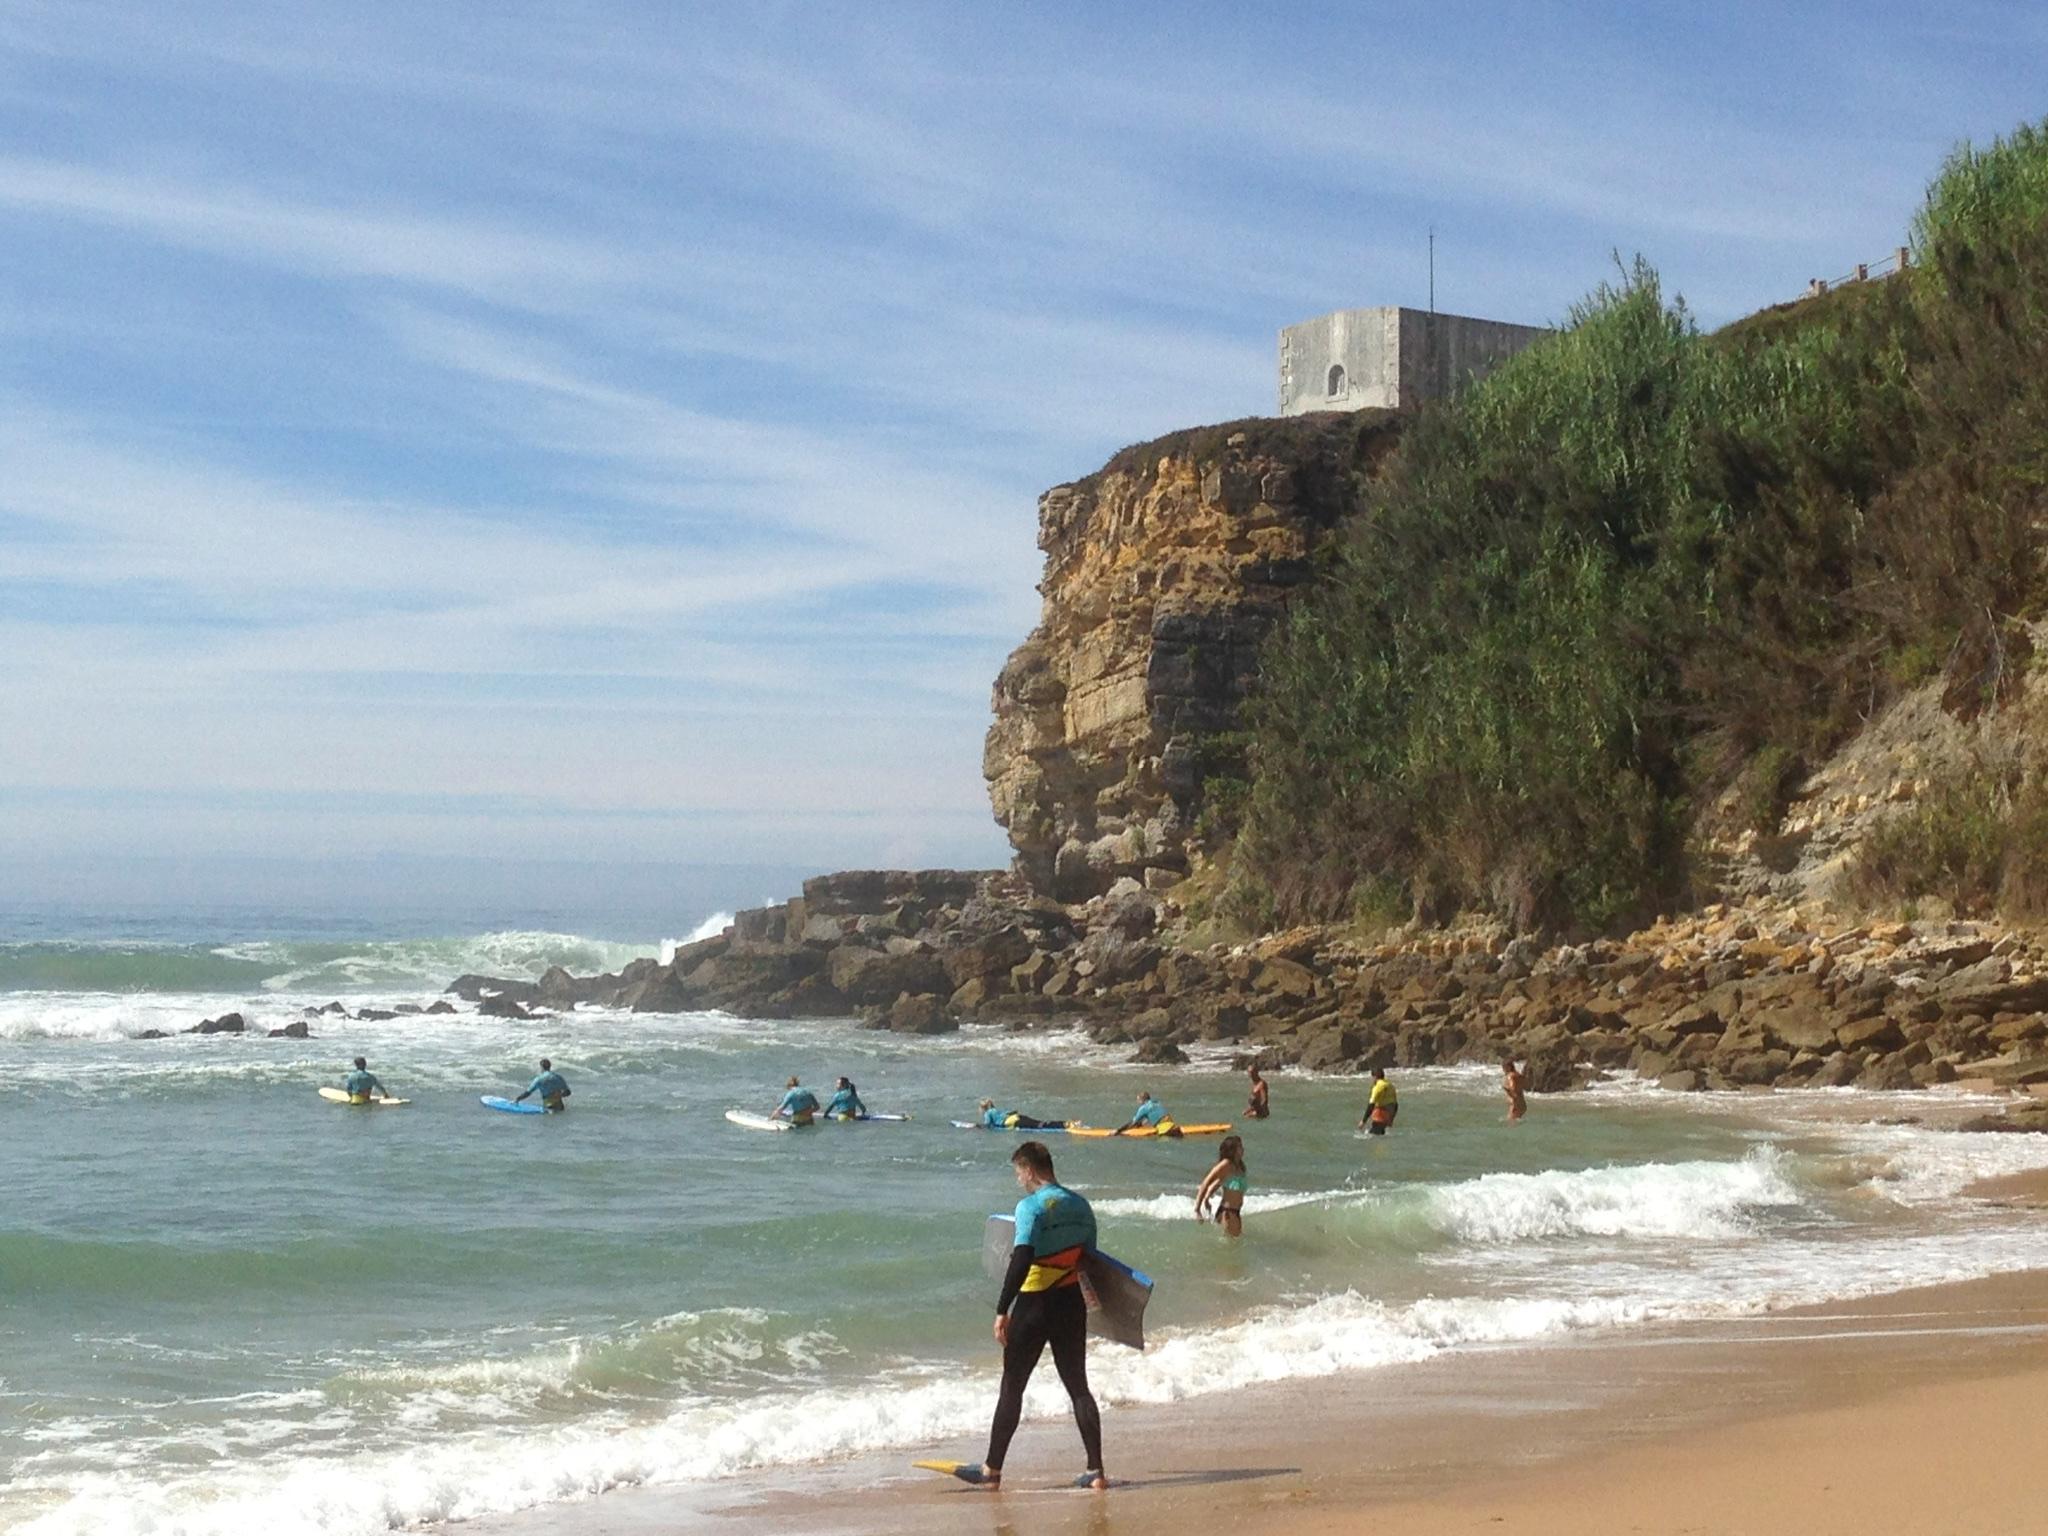 Surfing Magoito beach